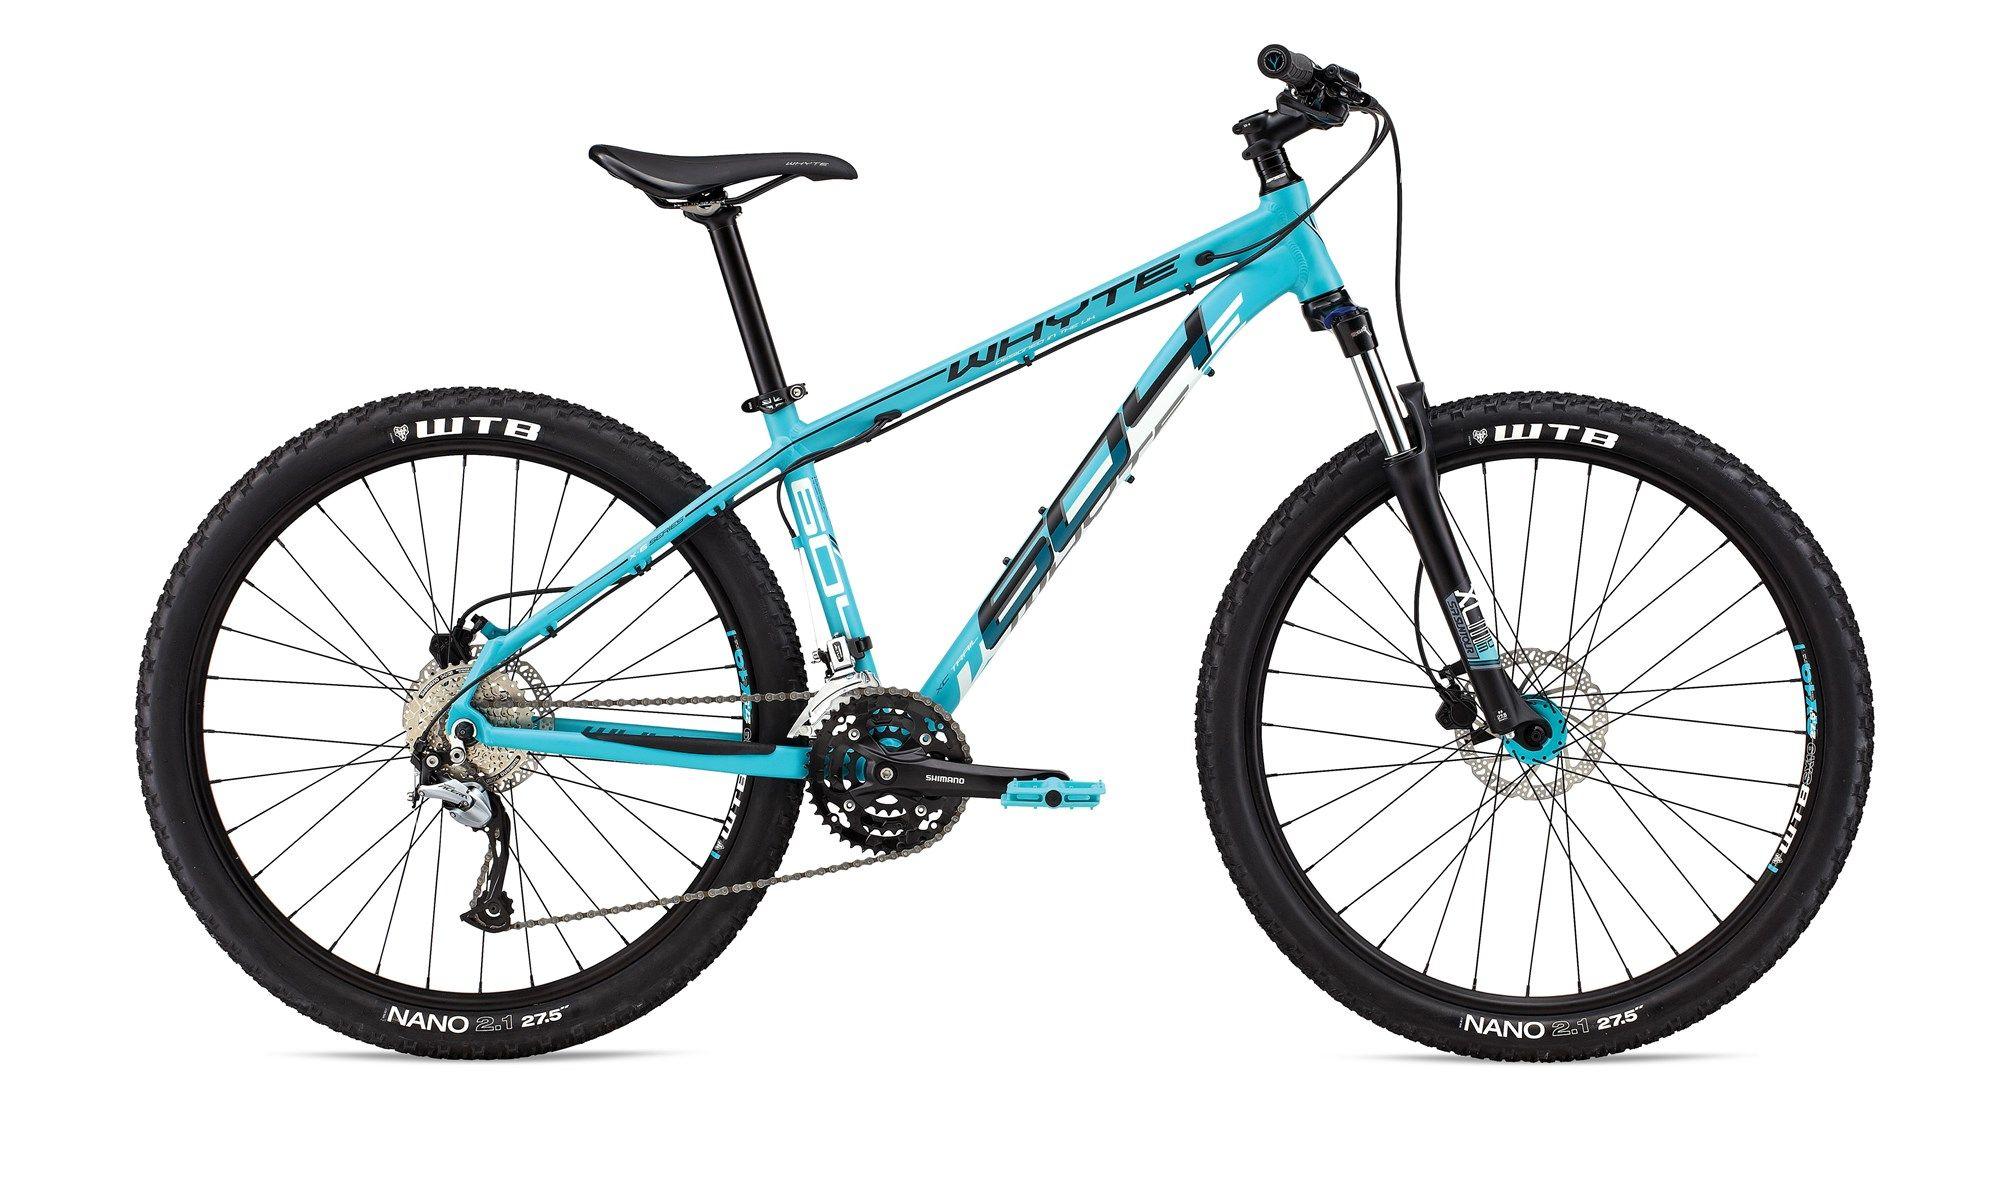 82fce4ac1b0 Ex-Hire 2016 Whyte 604 Womens 650b Hardtail Mountain Bike Blue ...